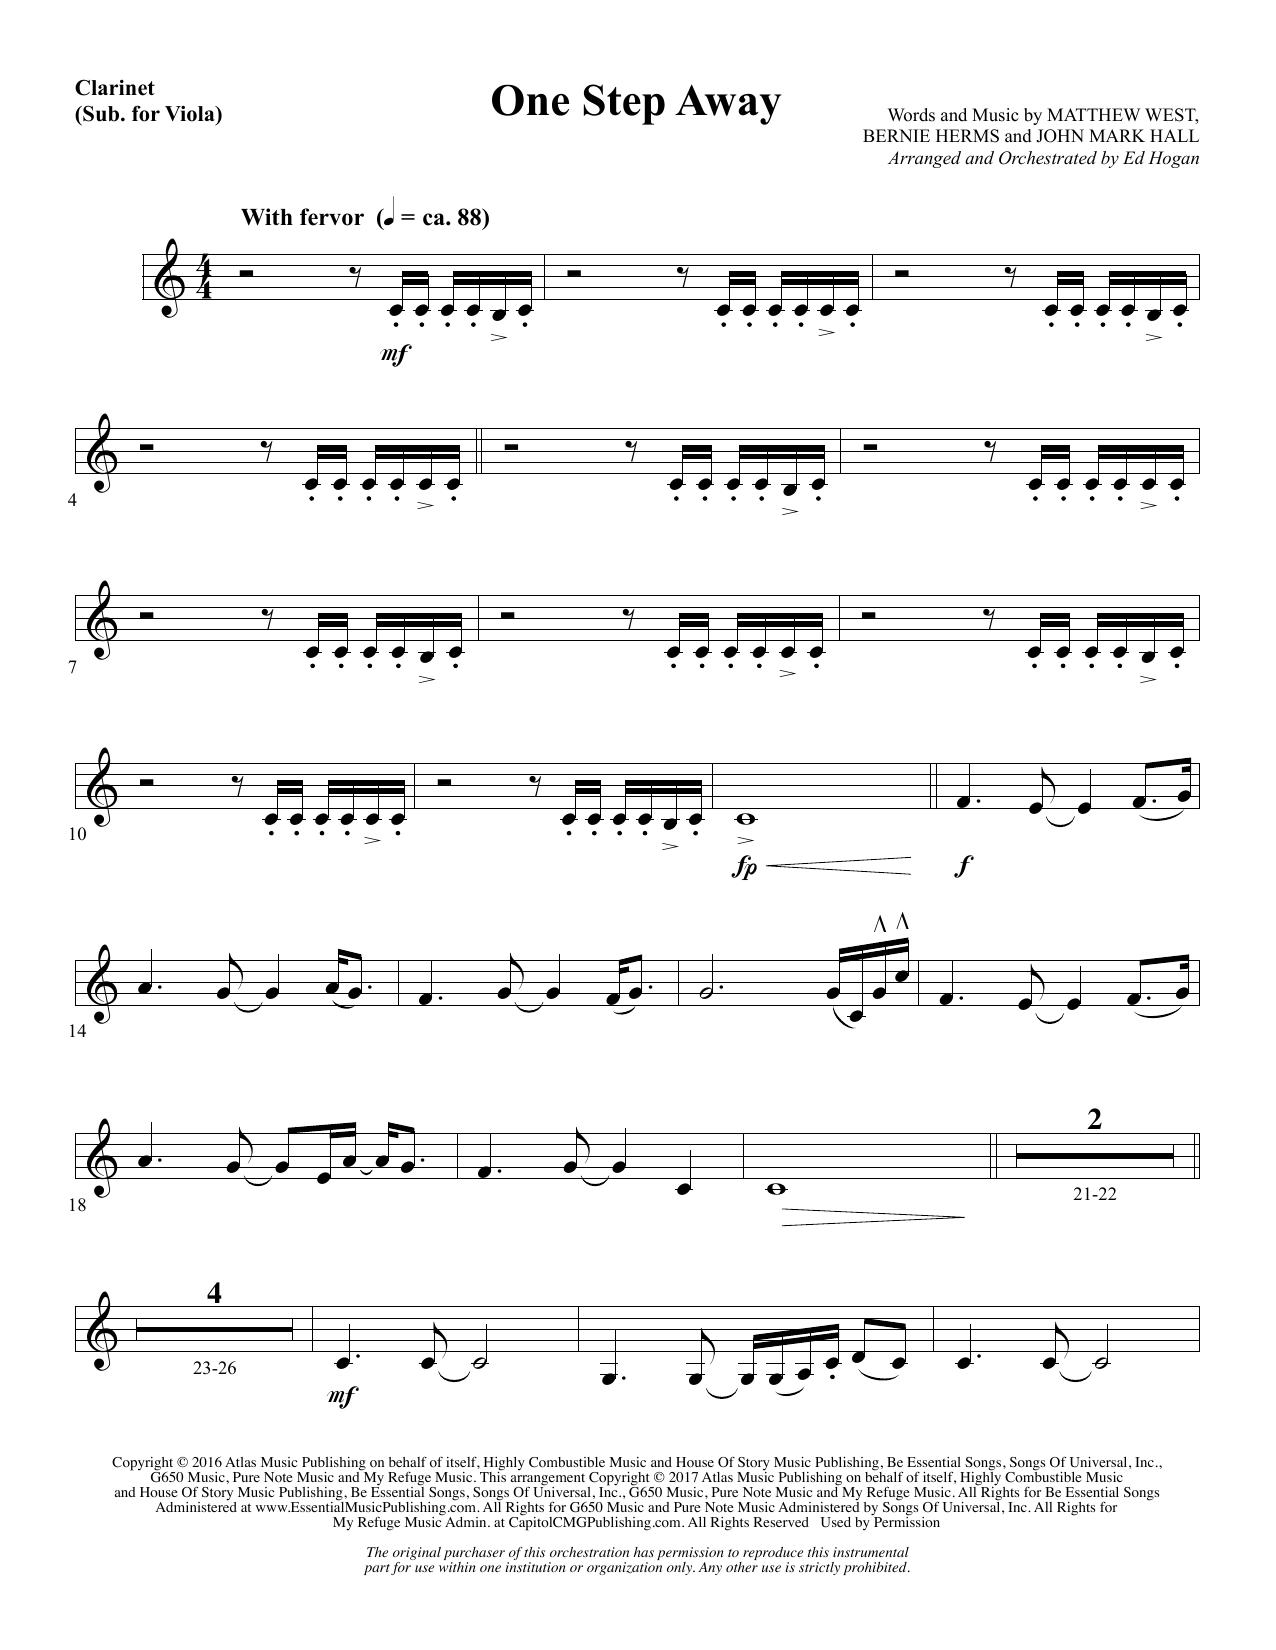 Ed Hogan One Step Away - Clarinet (sub Viola) sheet music notes and chords. Download Printable PDF.